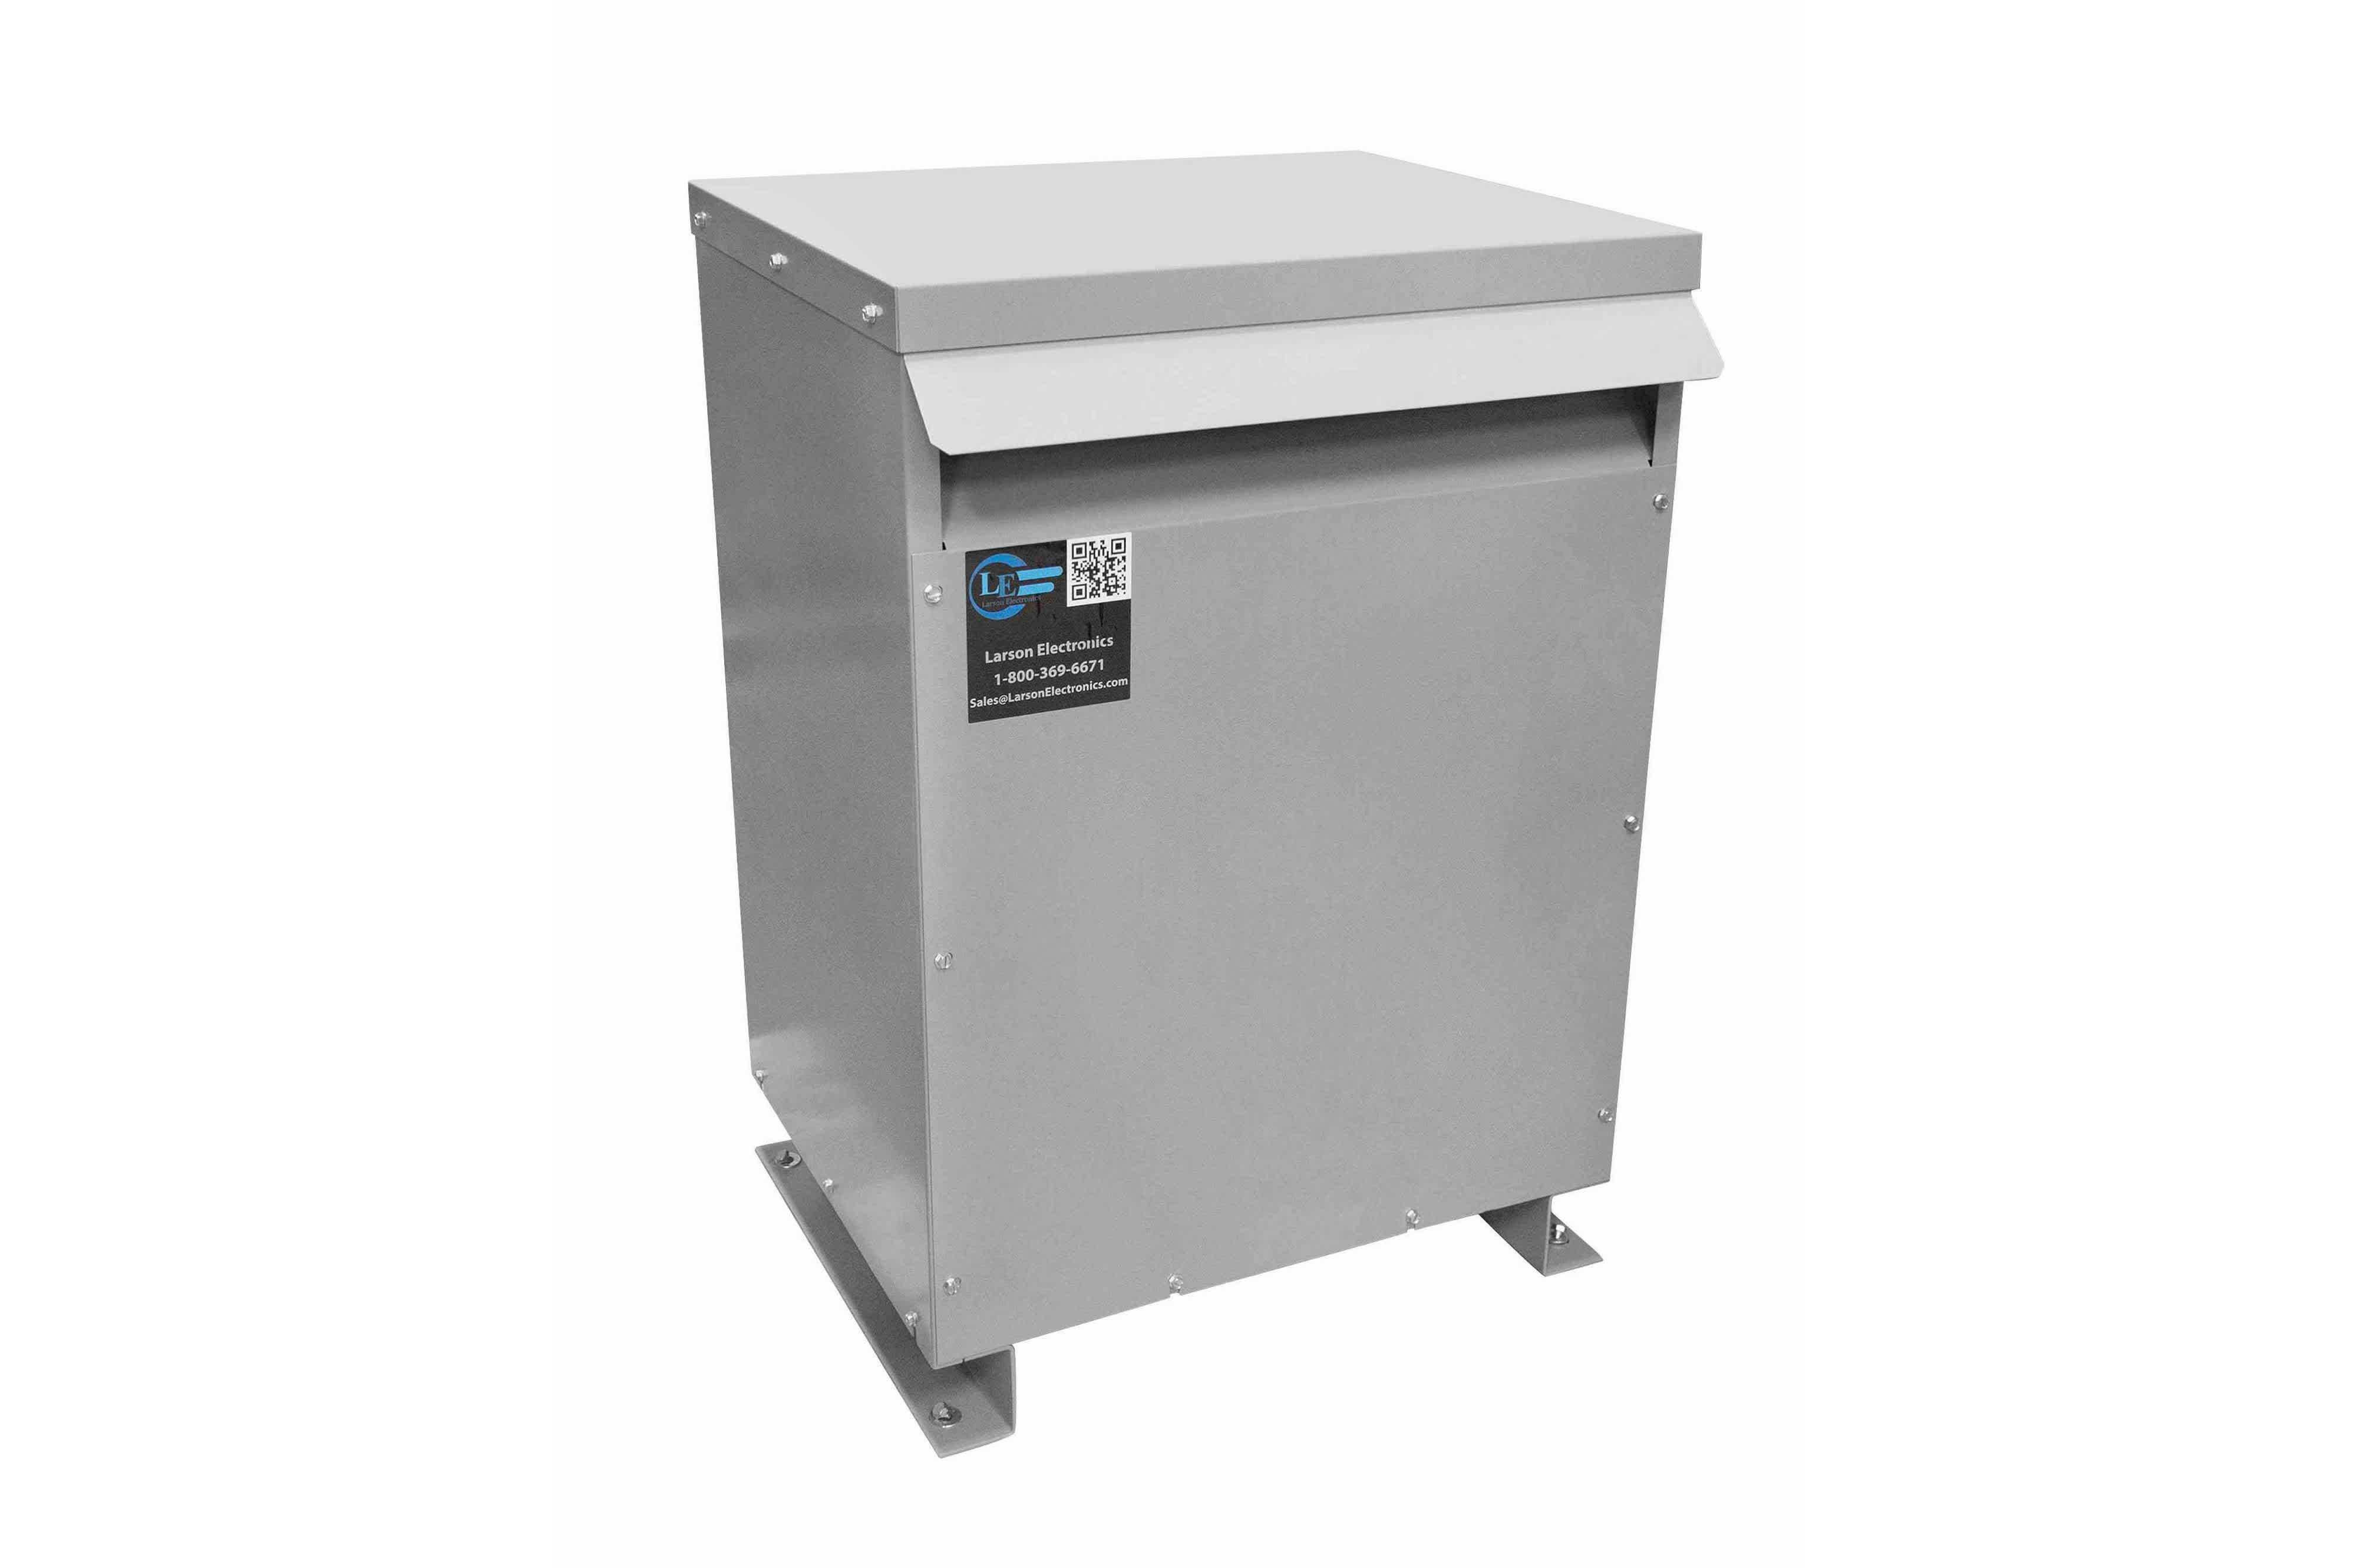 10 kVA 3PH Isolation Transformer, 575V Wye Primary, 240V/120 Delta Secondary, N3R, Ventilated, 60 Hz